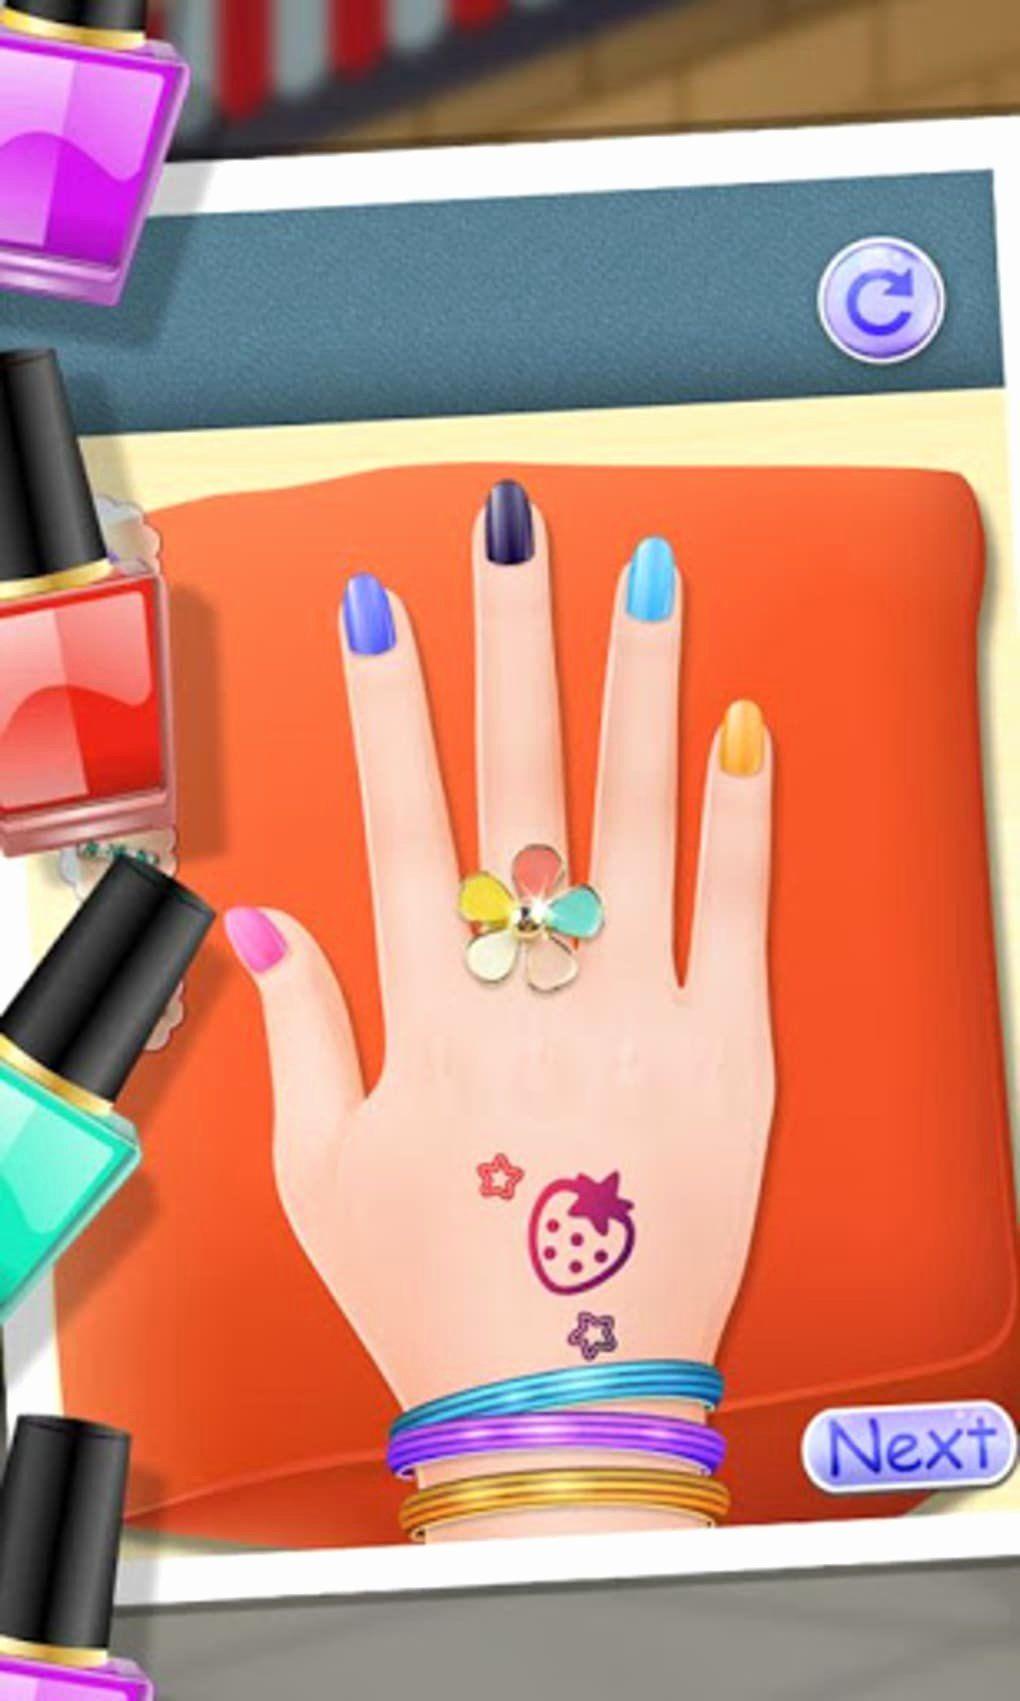 Hello Kitty Nail Salon Game : hello, kitty, salon, Hello, Kitty, Salon, Beautiful, Makeover, Girls, Games, Android, Download, Games,, Nails,, Nails